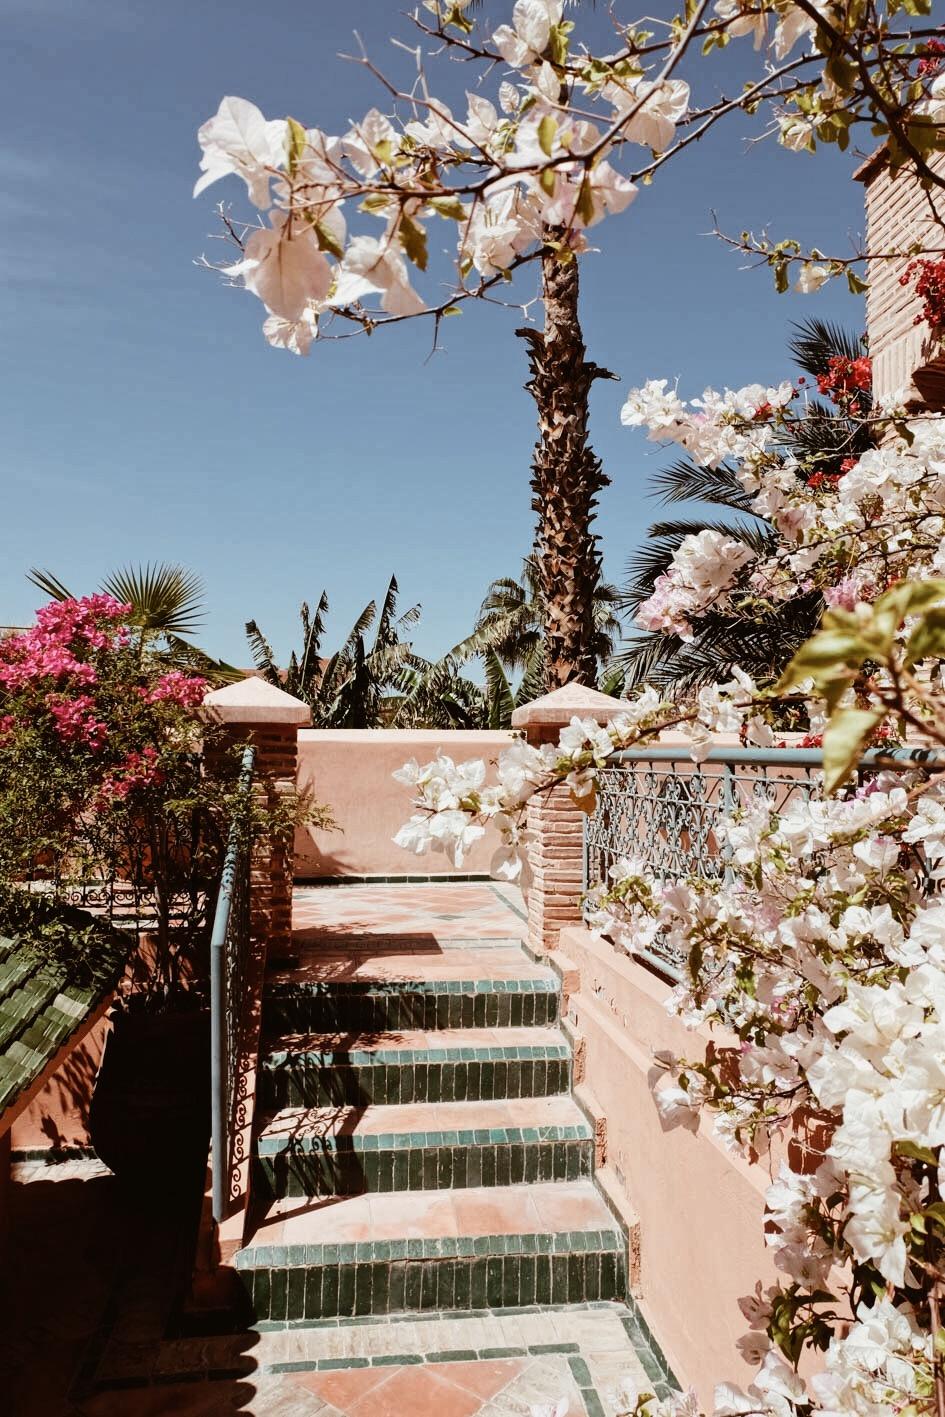 Carnet Sauvage - Blog voyage Marrakech, se loger Palais Lamrani